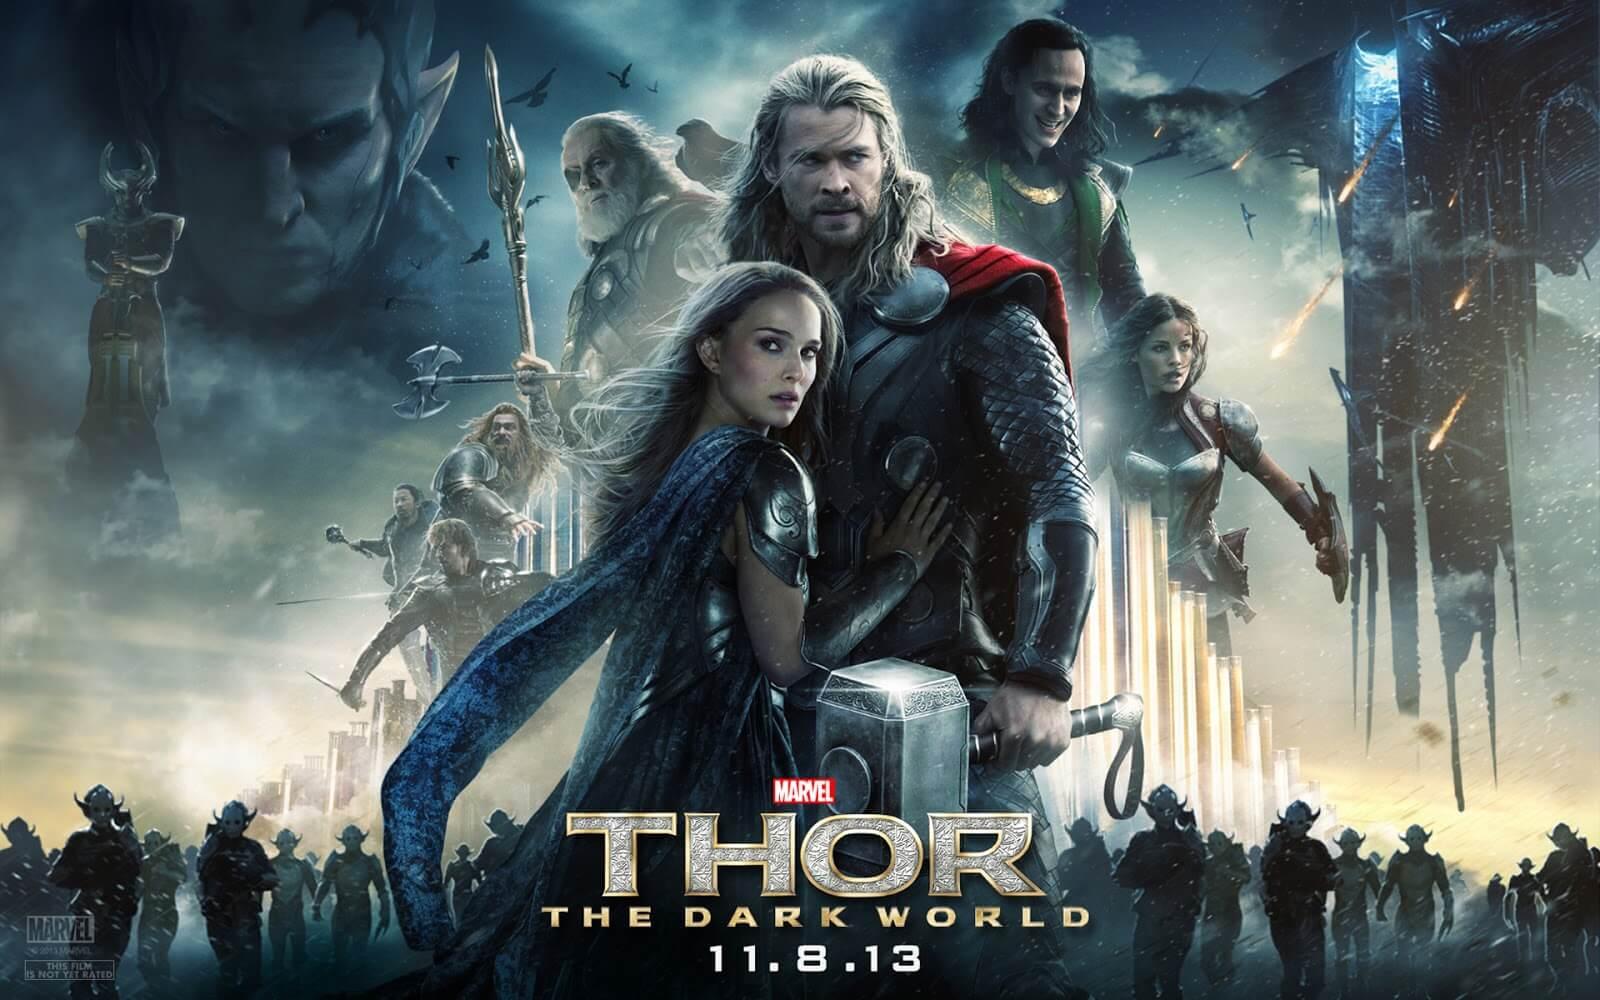 thor-the-dark-world-marvel-2013-movie